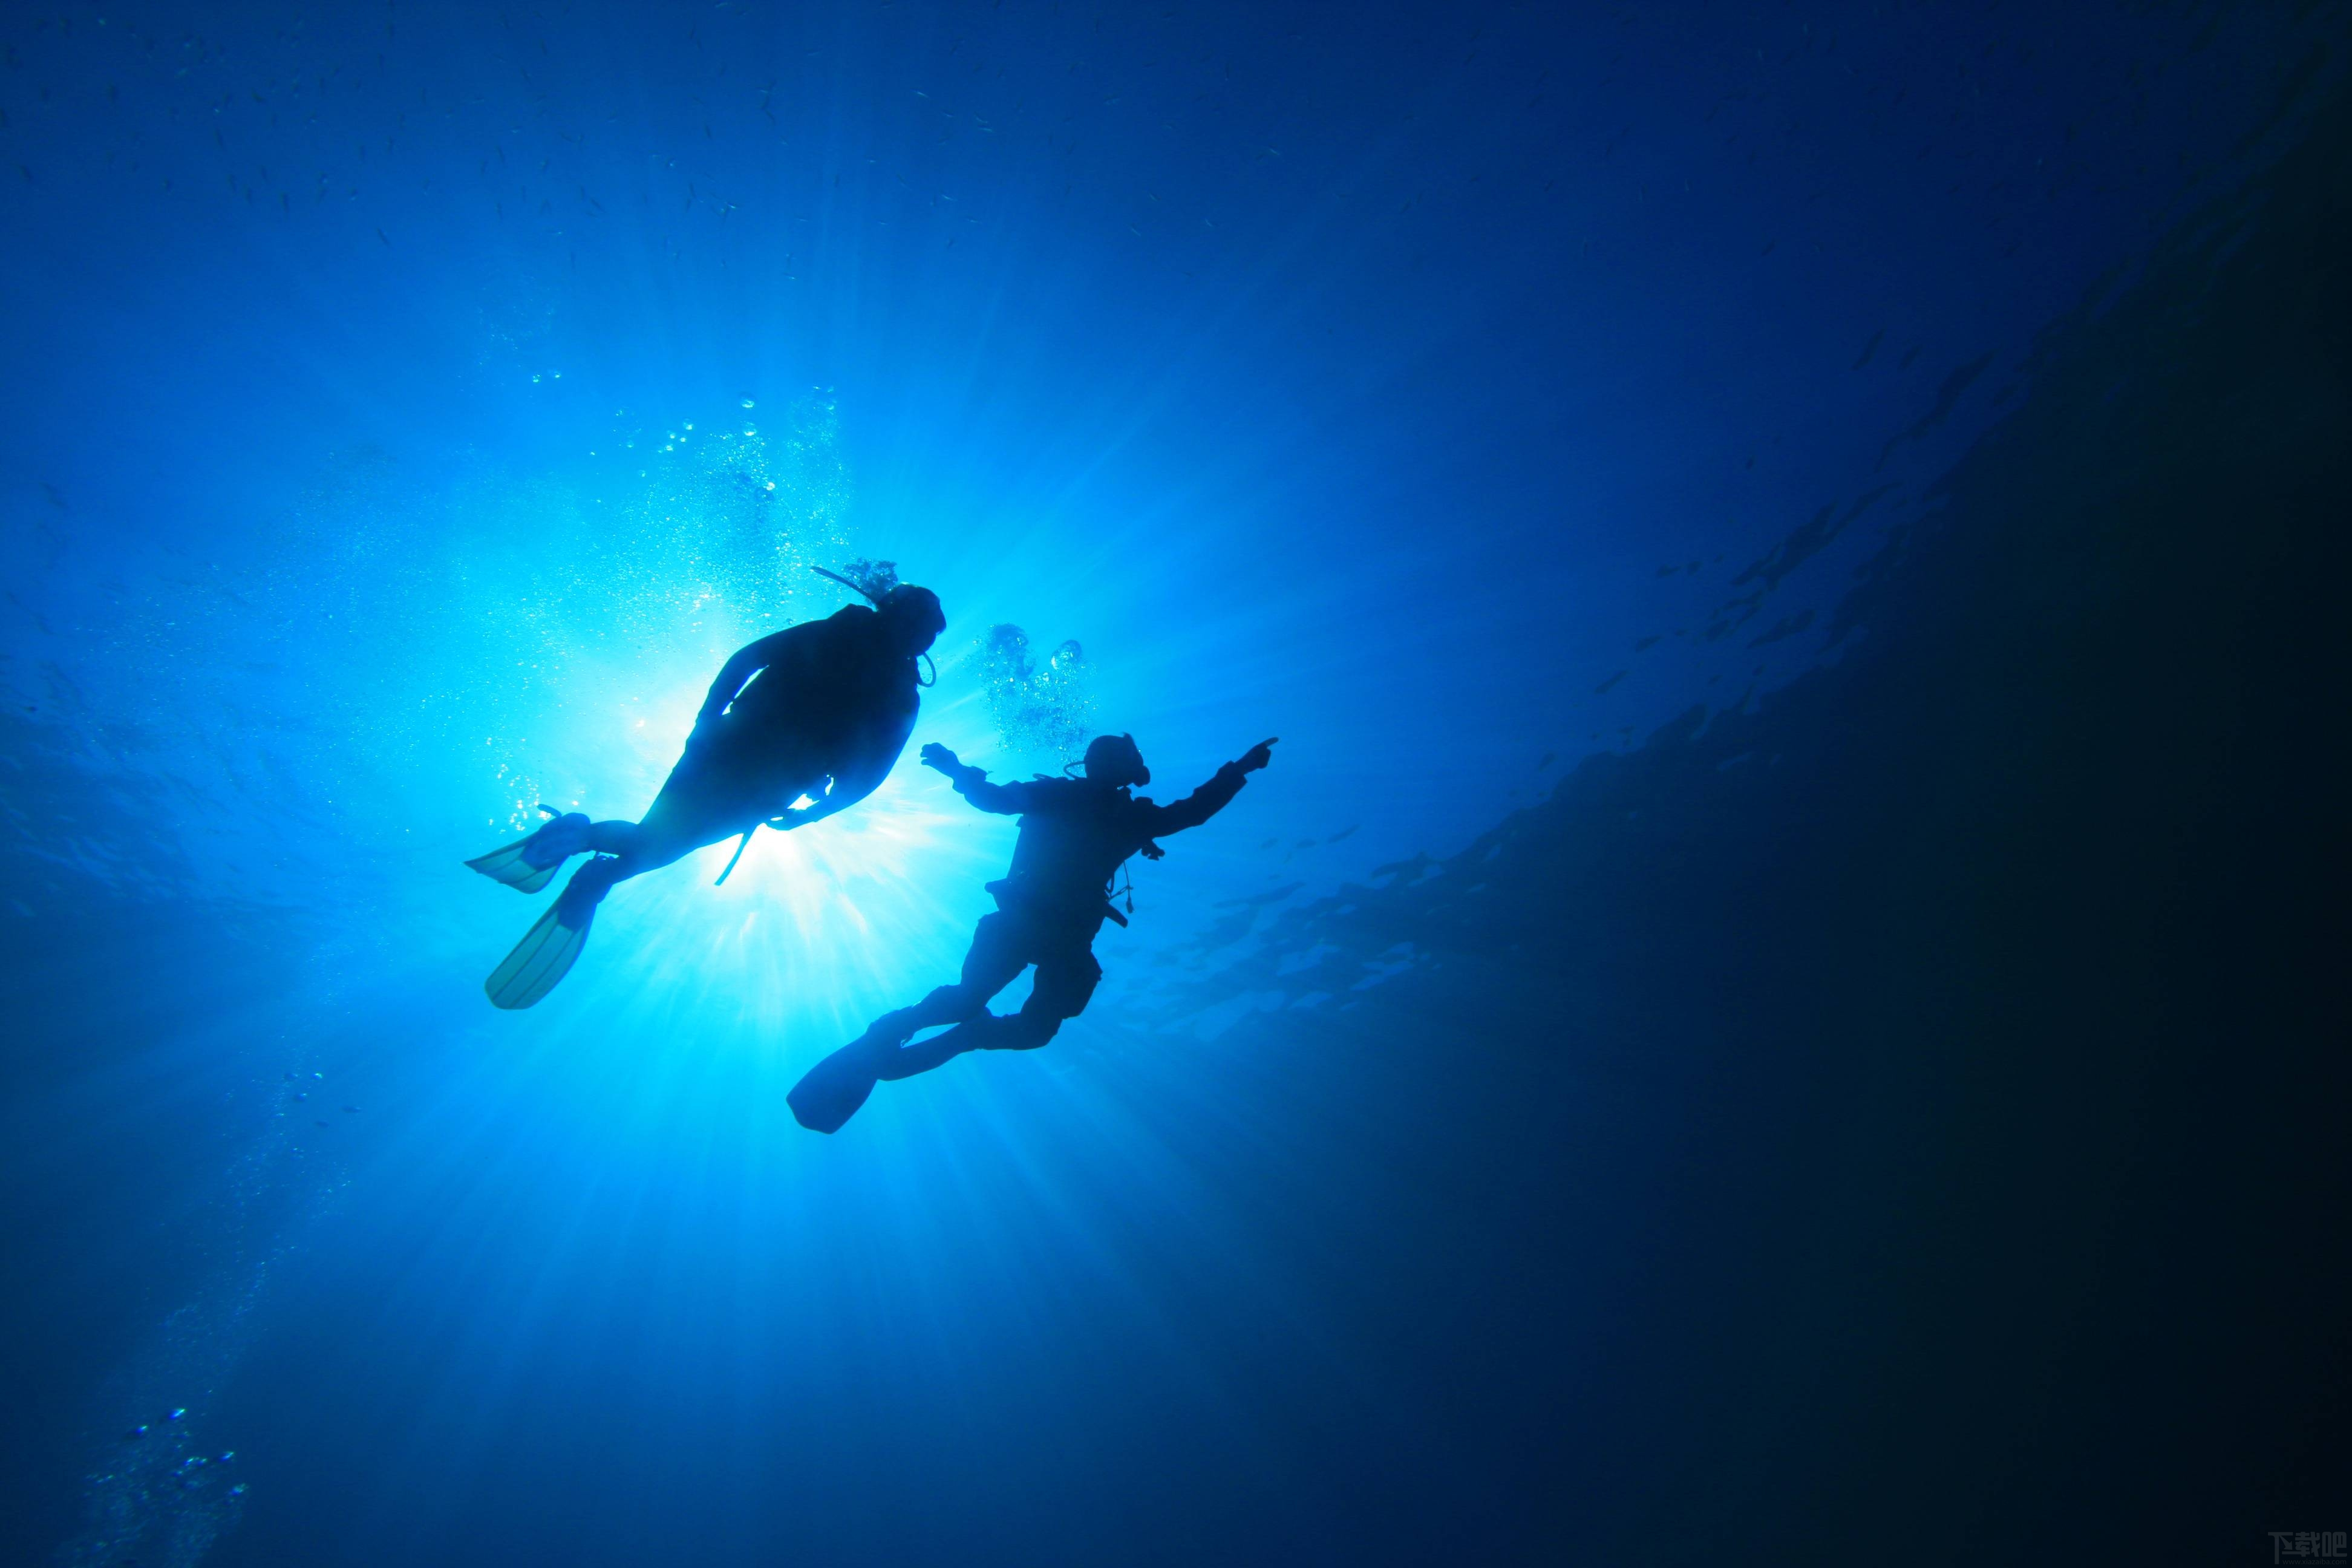 Amazing Dives Screensaver